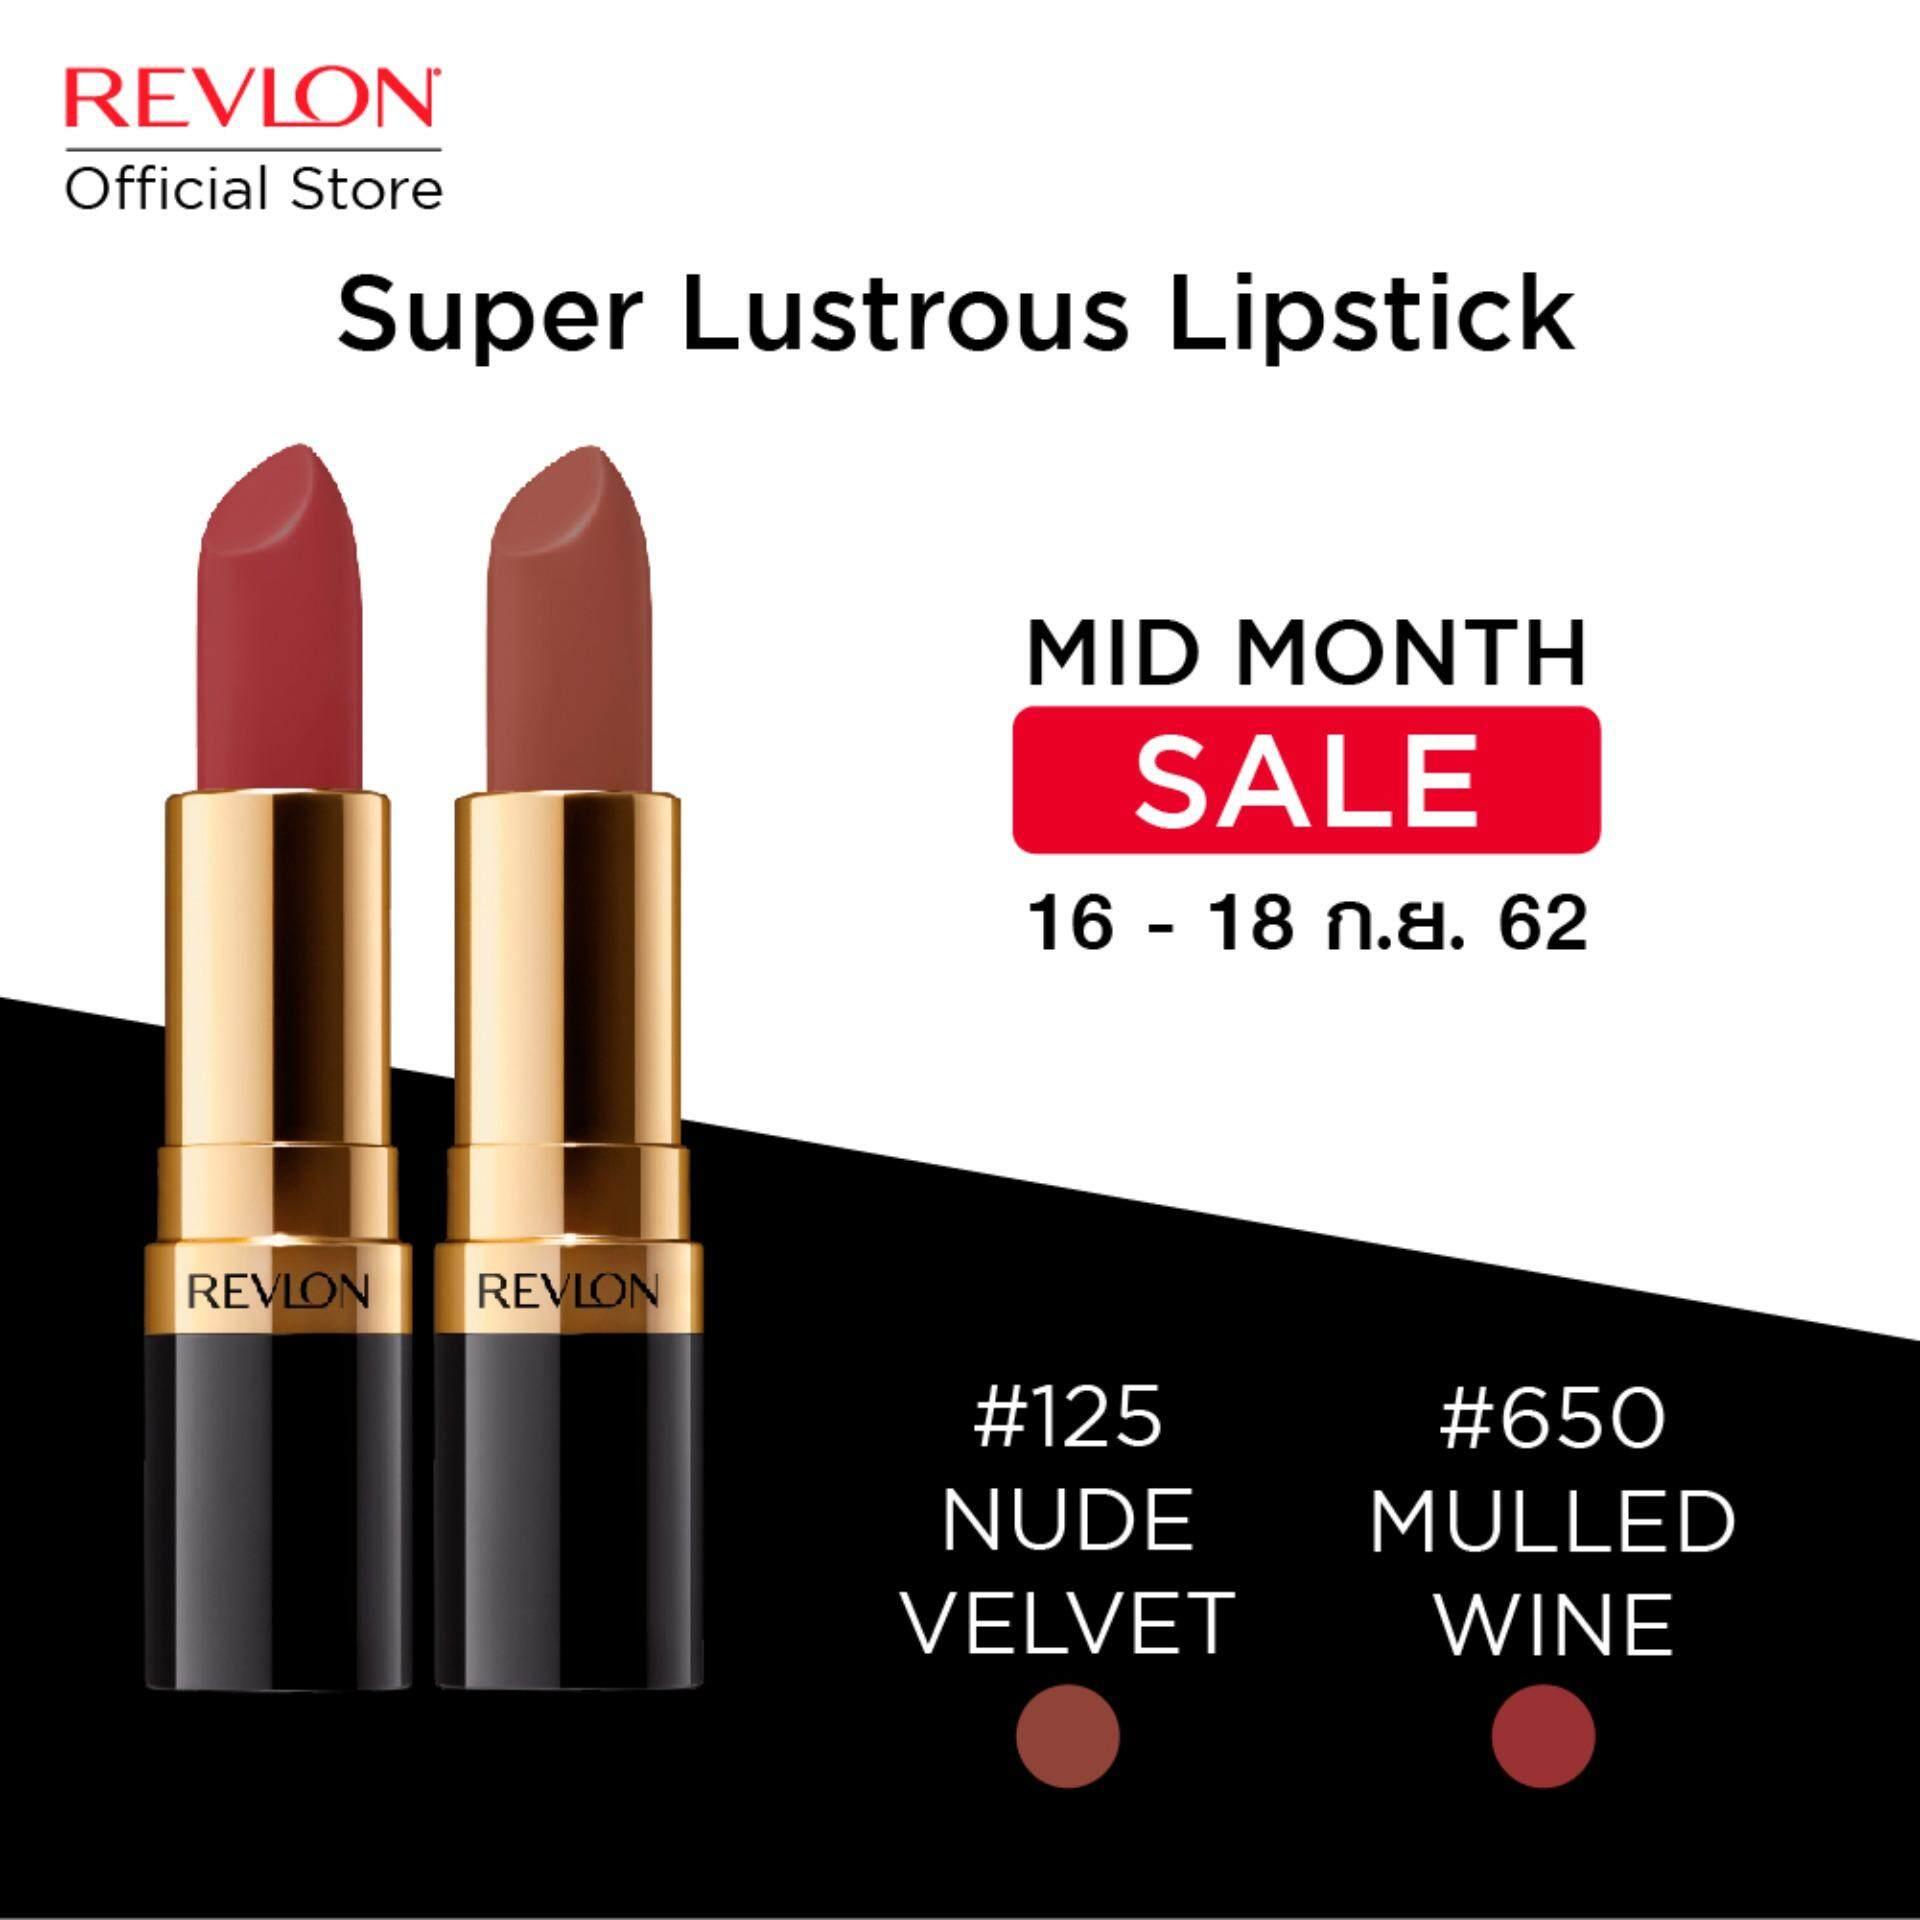 (Exclusive Set) ชุดเซต Revlon Super Lustrous Lipstick Set 2 แท่ง สี Mulled Wine + Nude Velvet เติมเรียวปากสวยให้คุณแม่